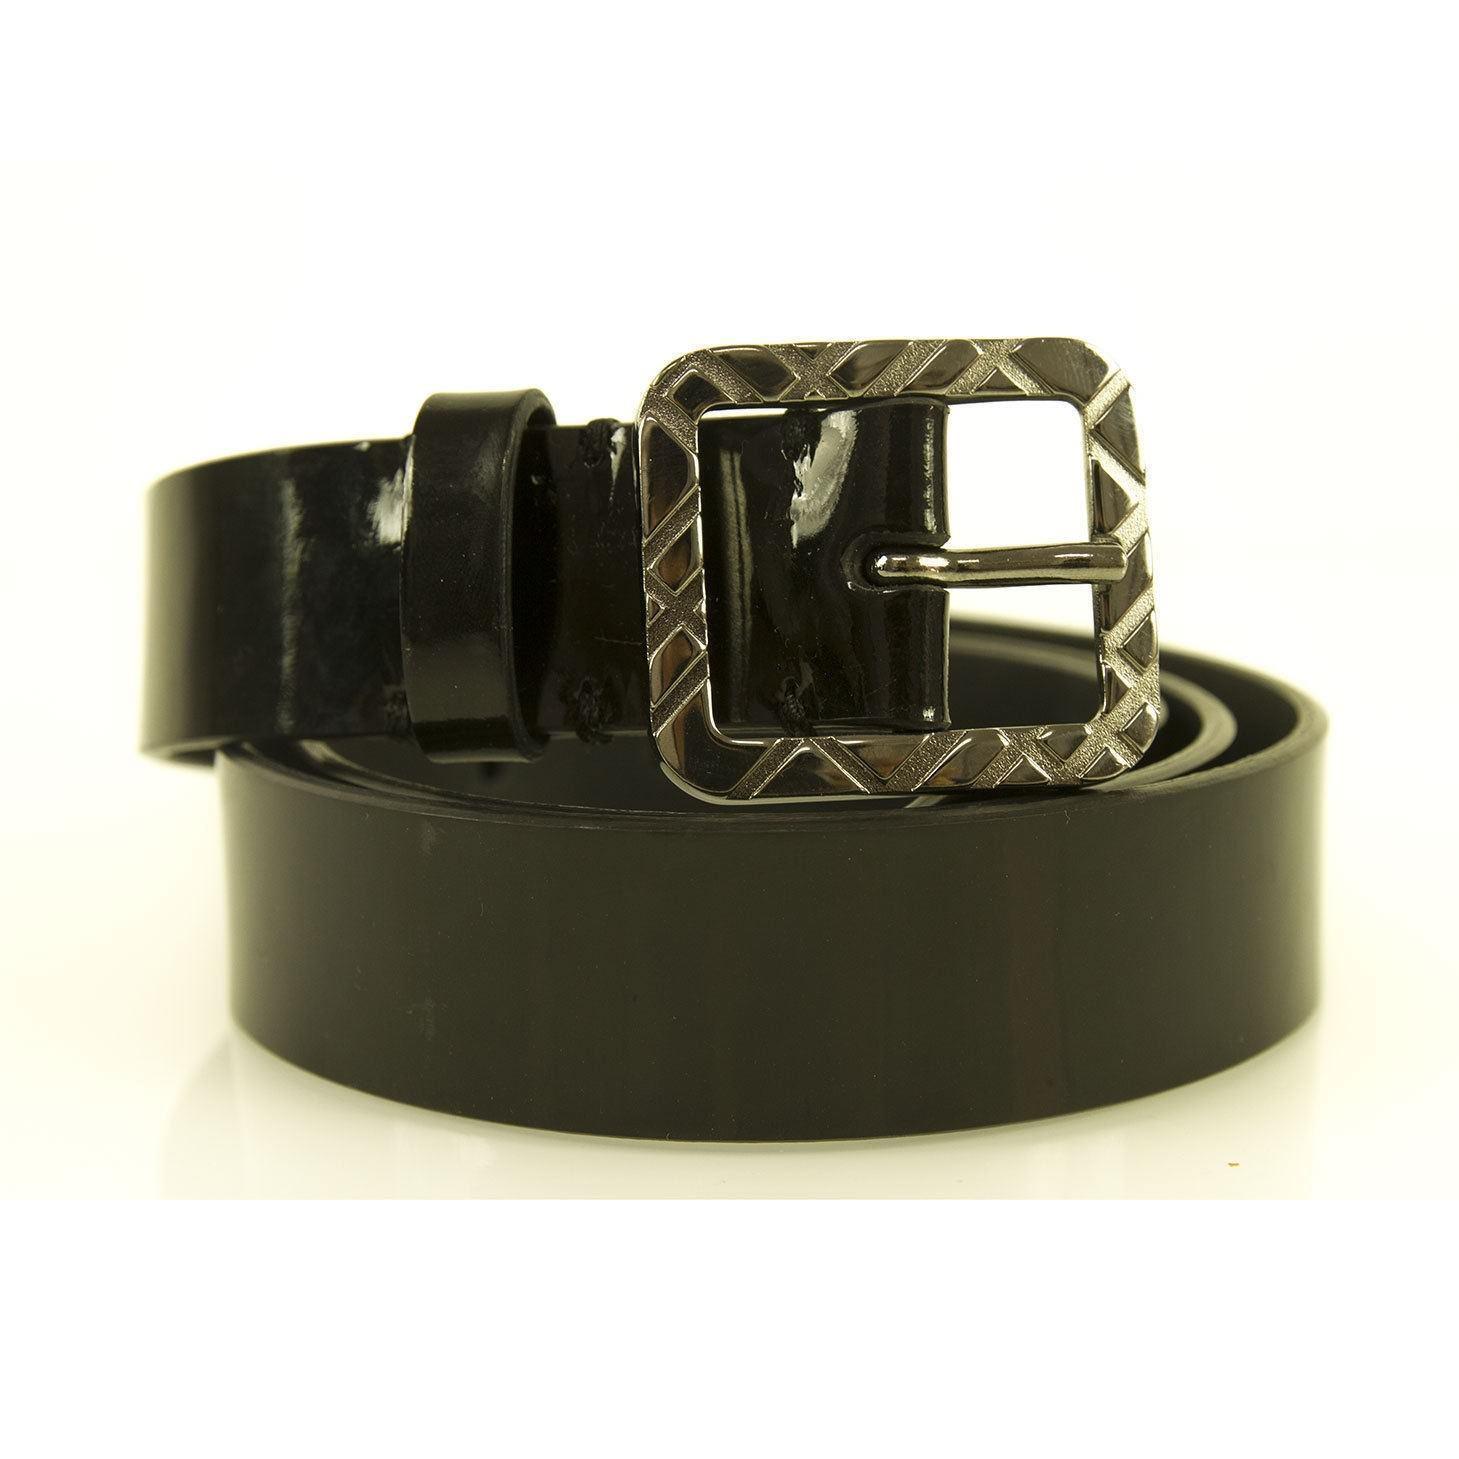 Burberry Women's Black Patent Leather Square Buckle Nova Check Belt sz 36 / 90 - $153.45